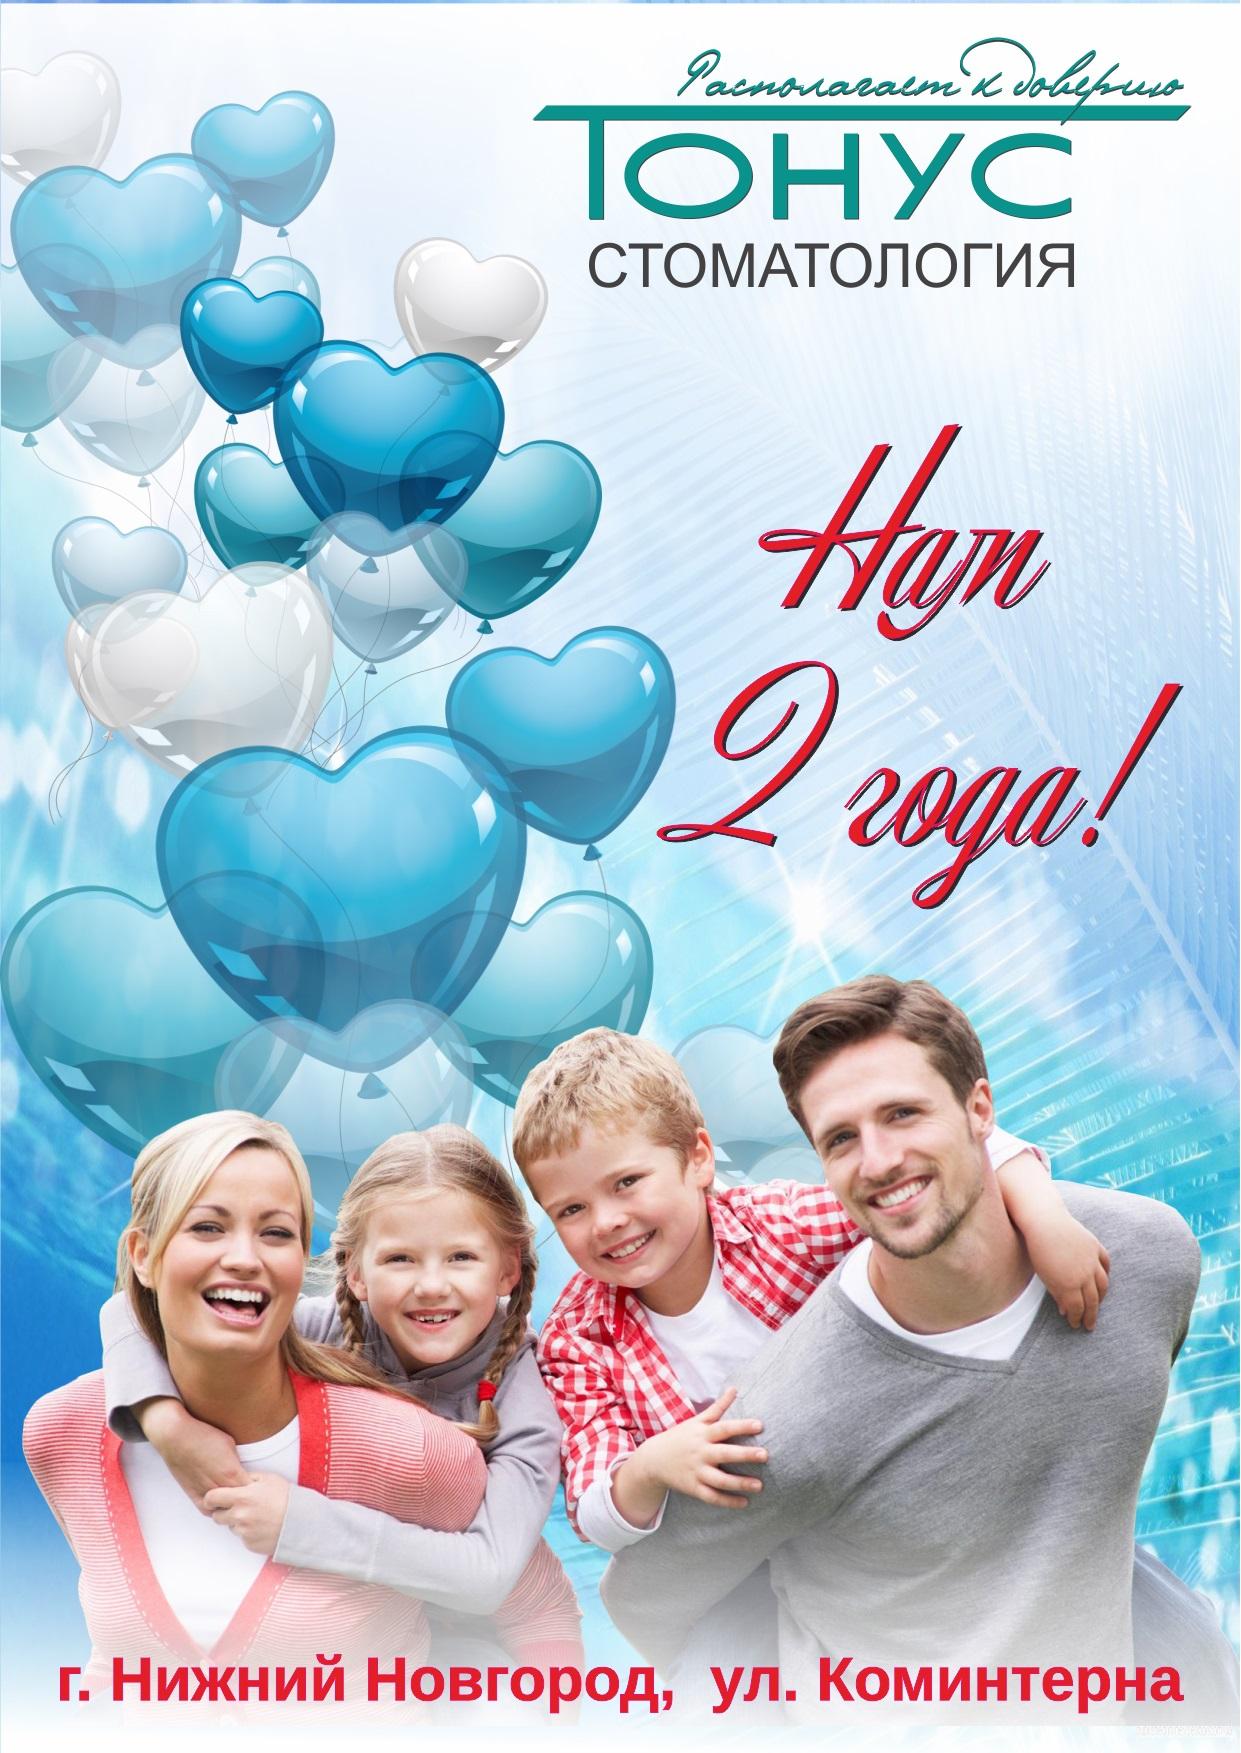 Семейной стоматологии «Тонус» на ул. Коминтерна - 2 года!